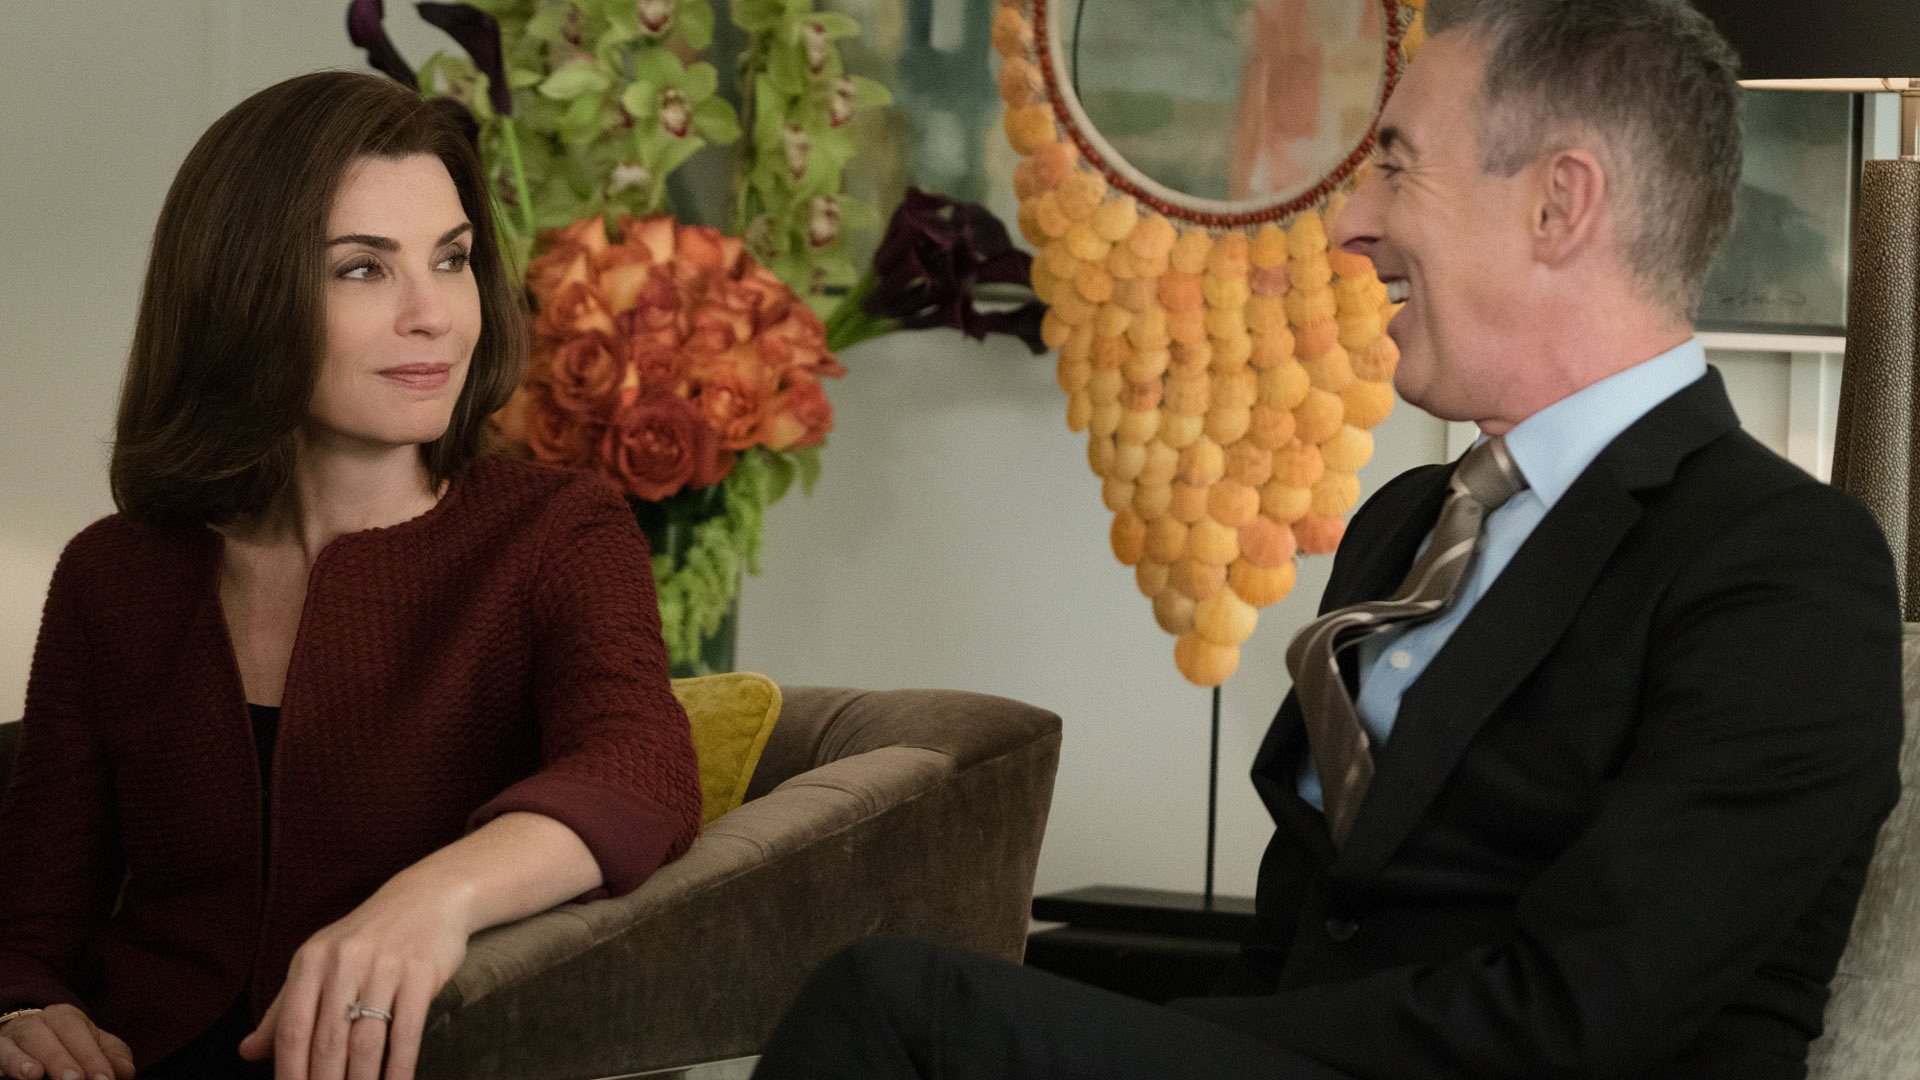 Julianna Margulies as Alicia Florrick and Alan Cumming as Eli Gold